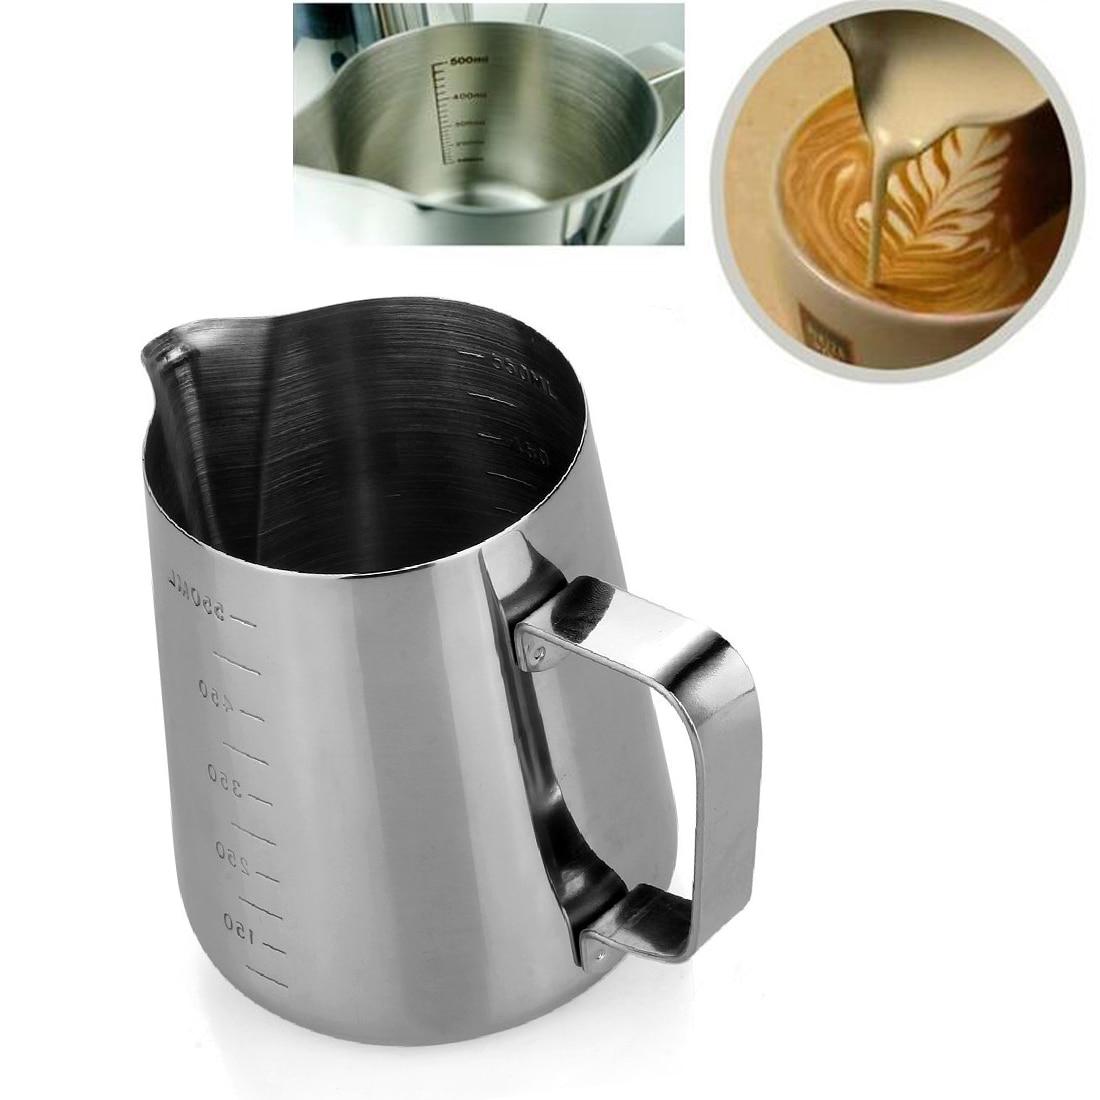 1pcs Silver Latte Coffee Milk Pitcher Jug Cup Dengan Garis 350ml Measurement Stainless Steel 350 600 1000ml Frothing